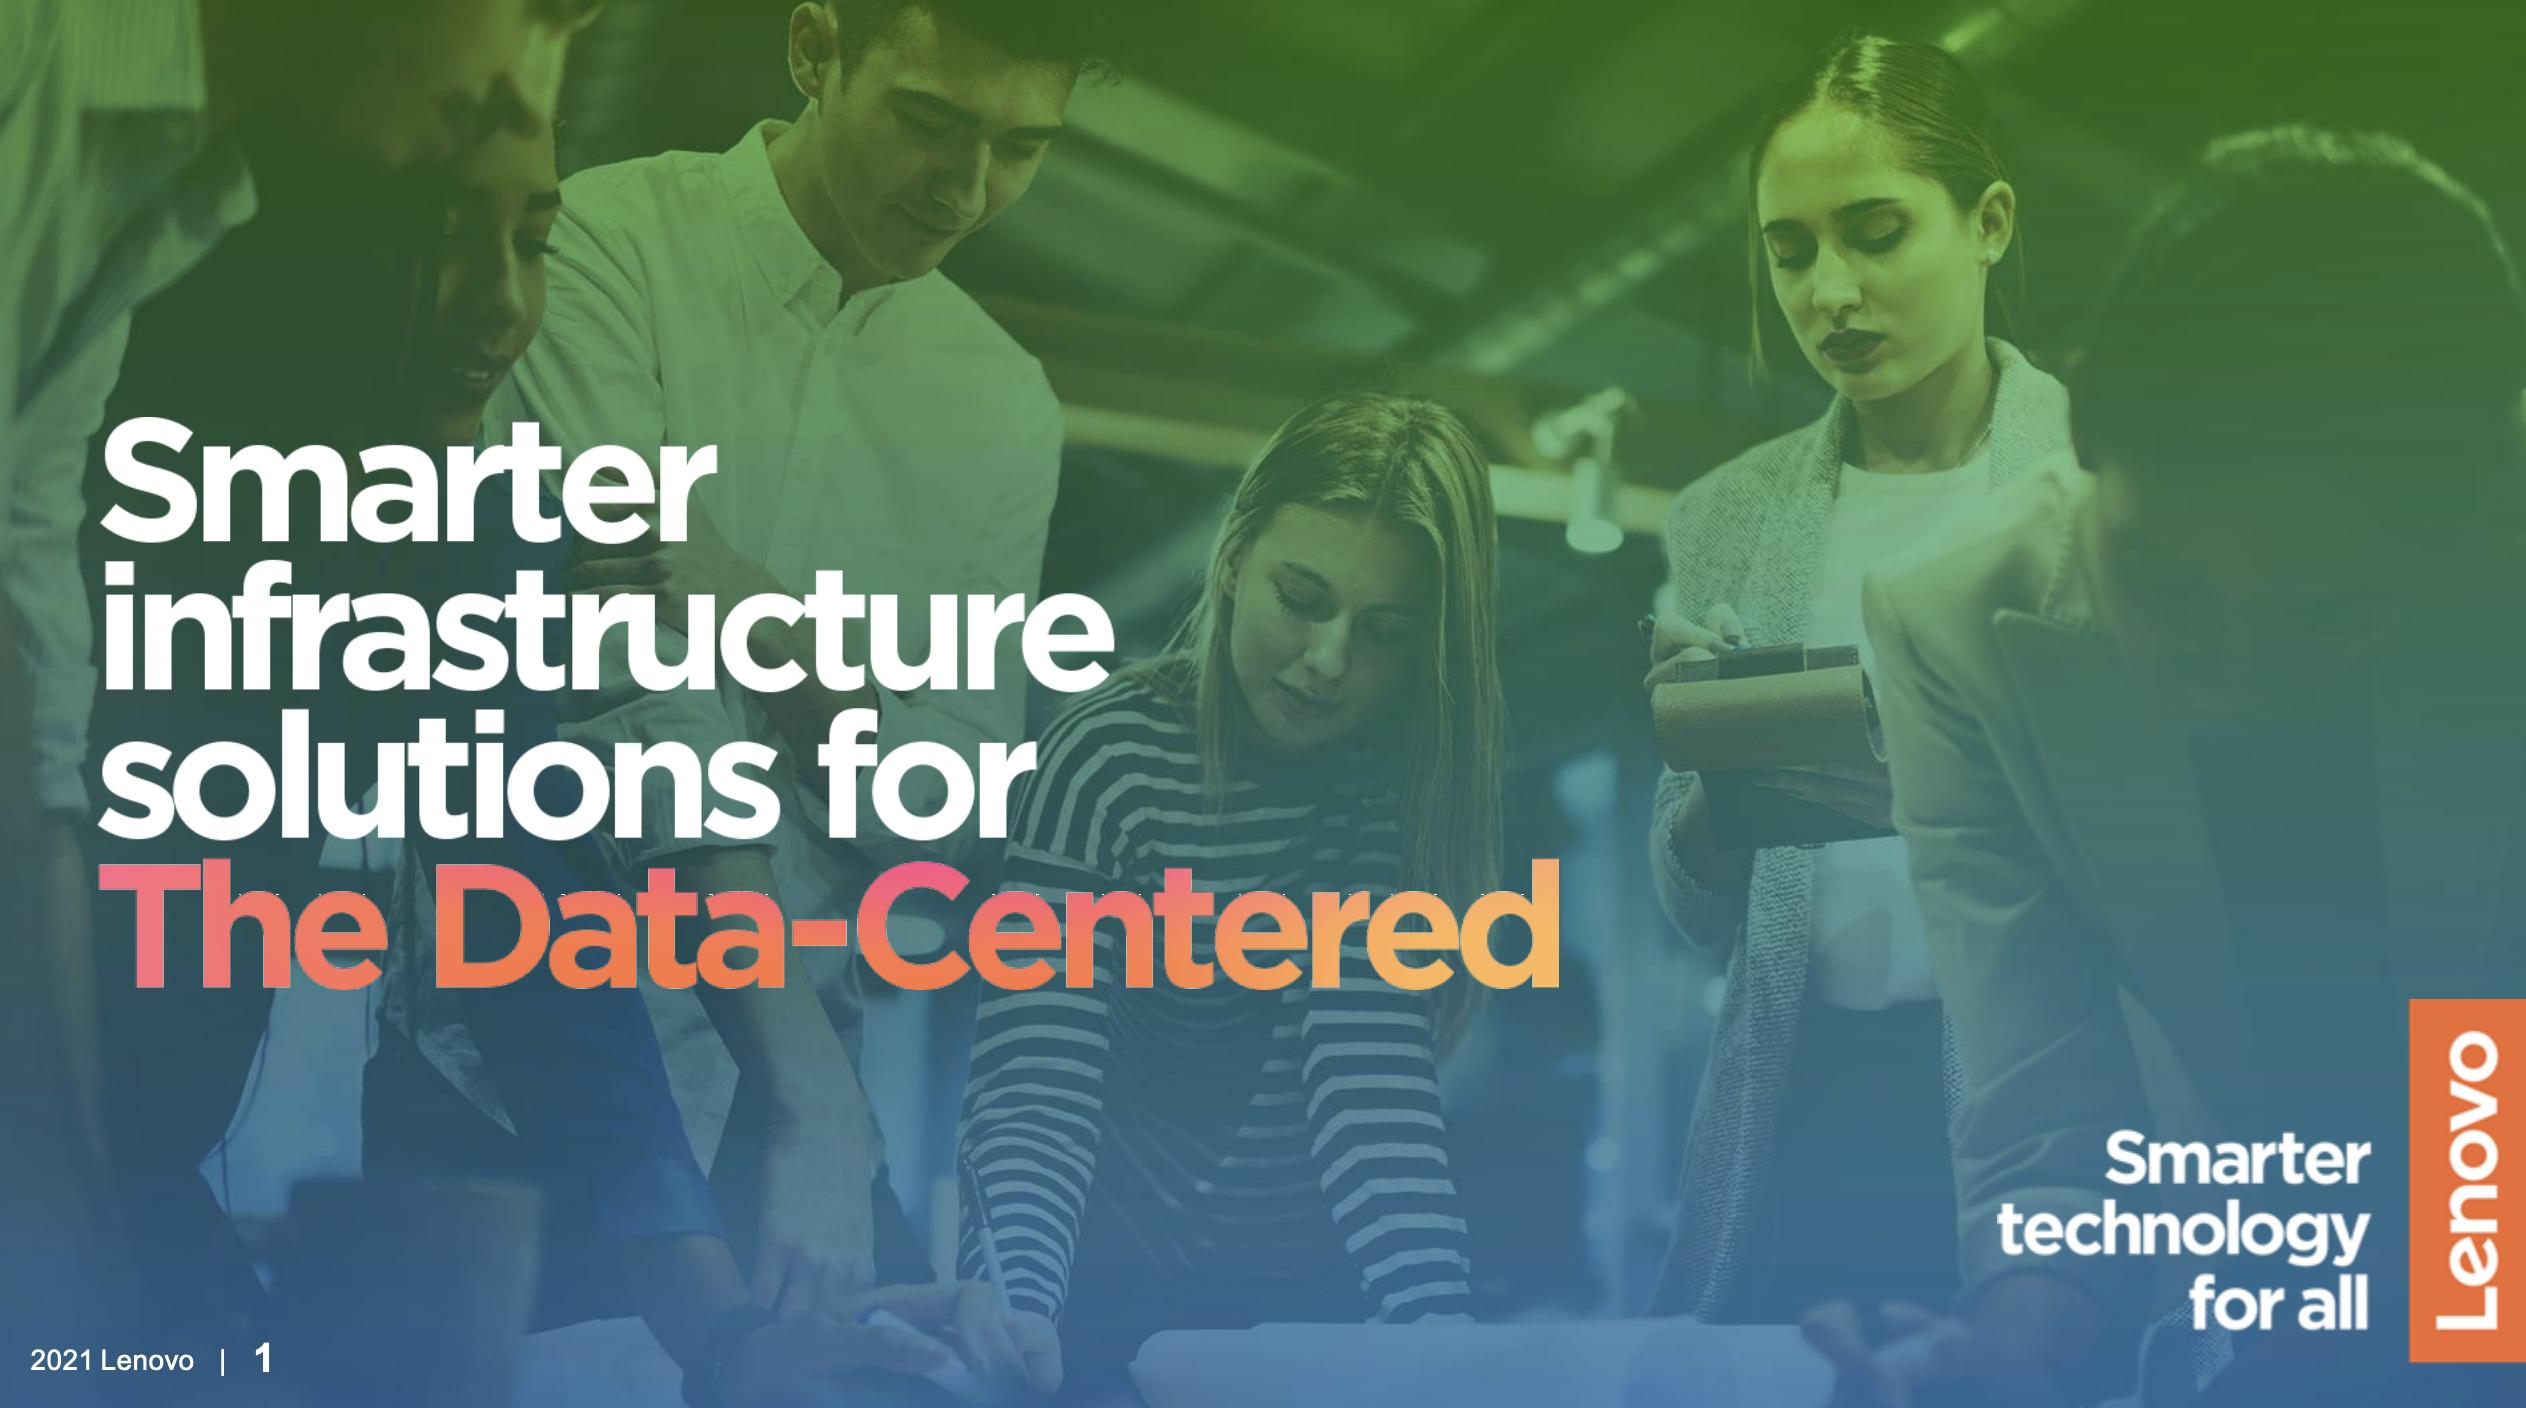 data-centered infrastructure